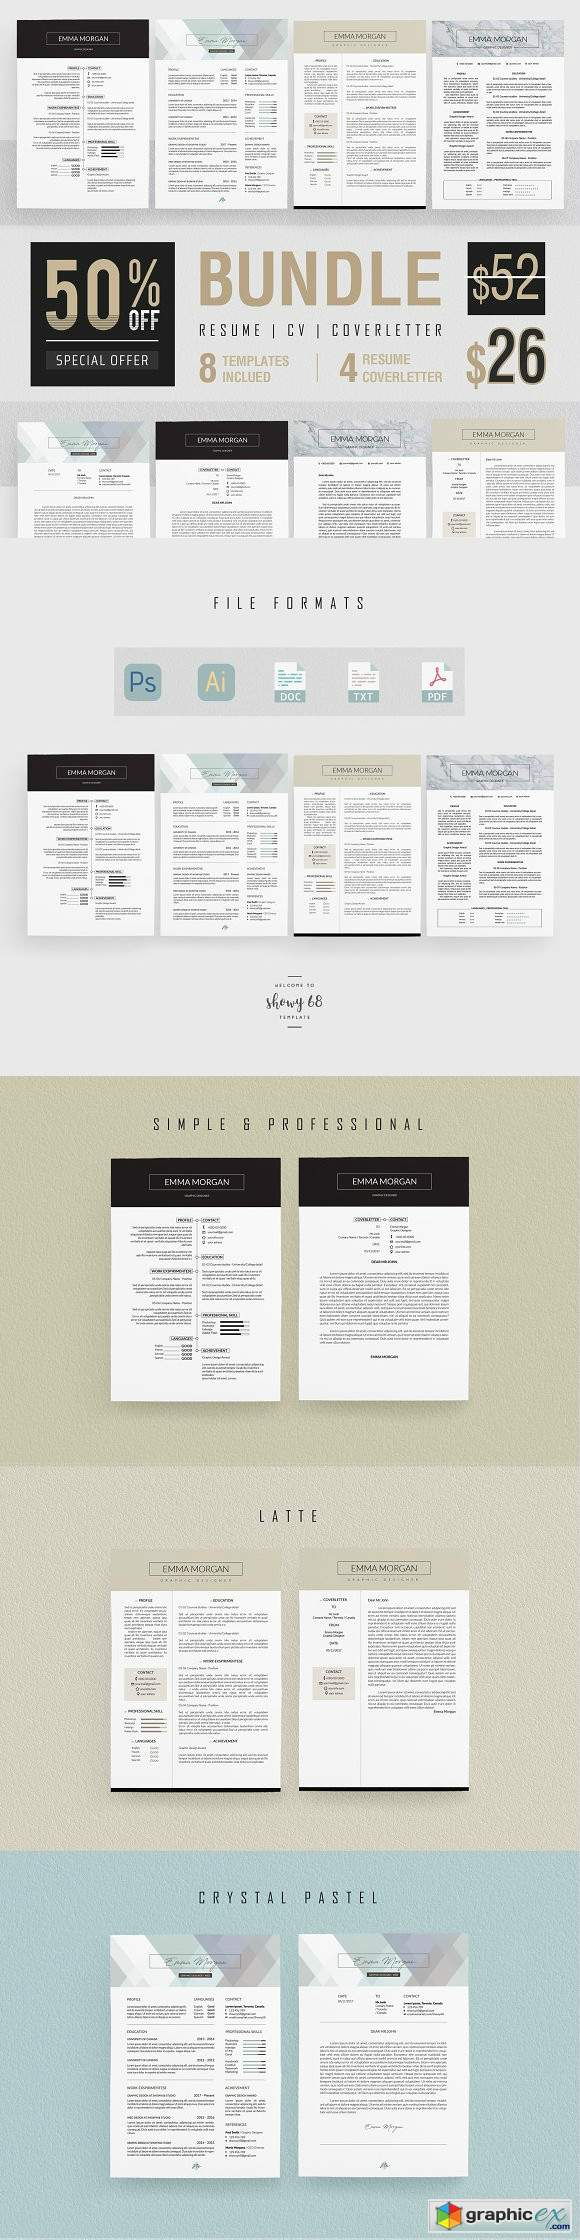 Professiona Resume BUNDLE Template M